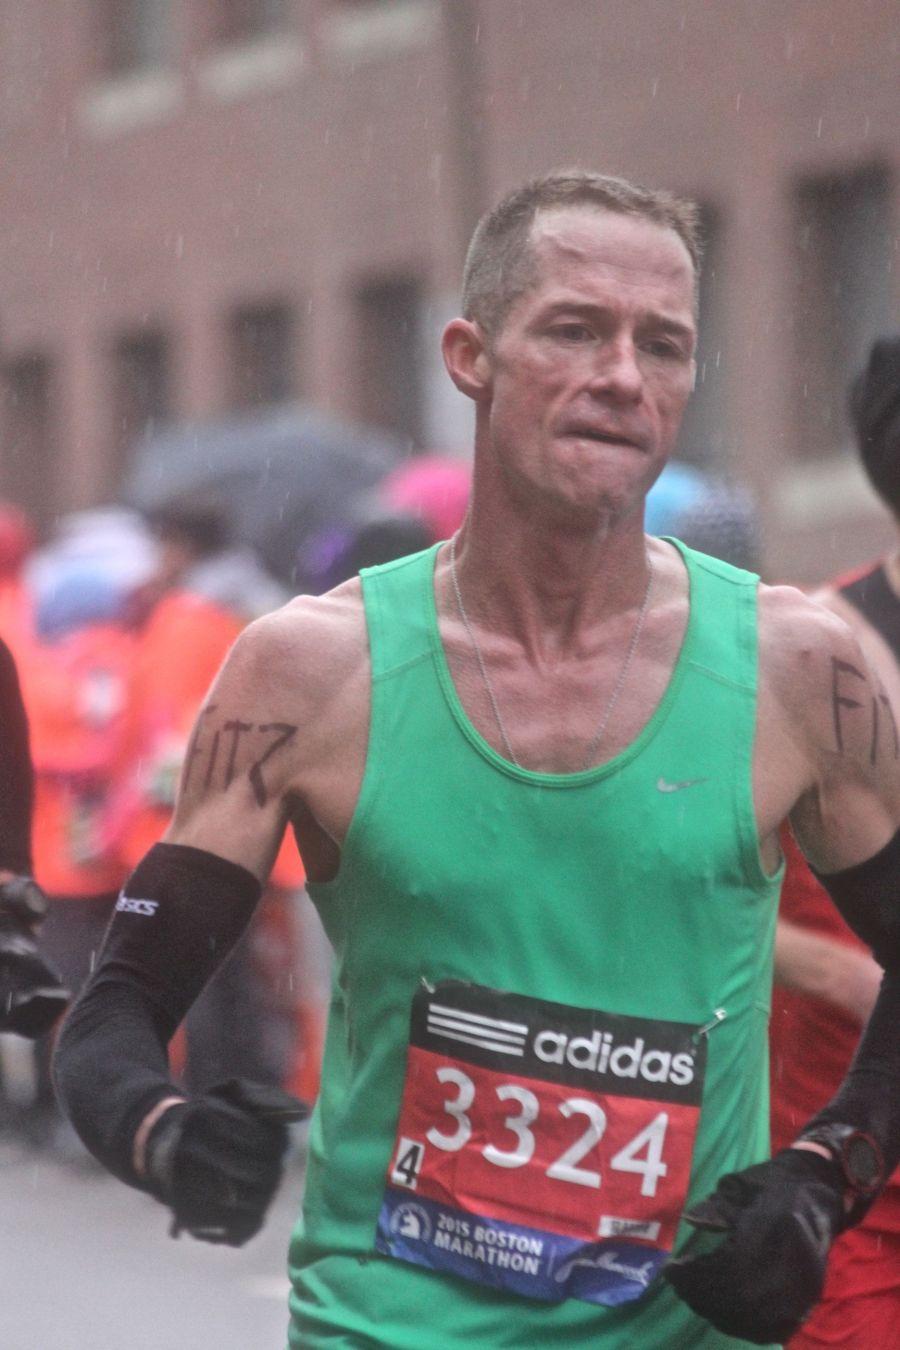 boston marathon april 20 2015 racer number 3324 rain